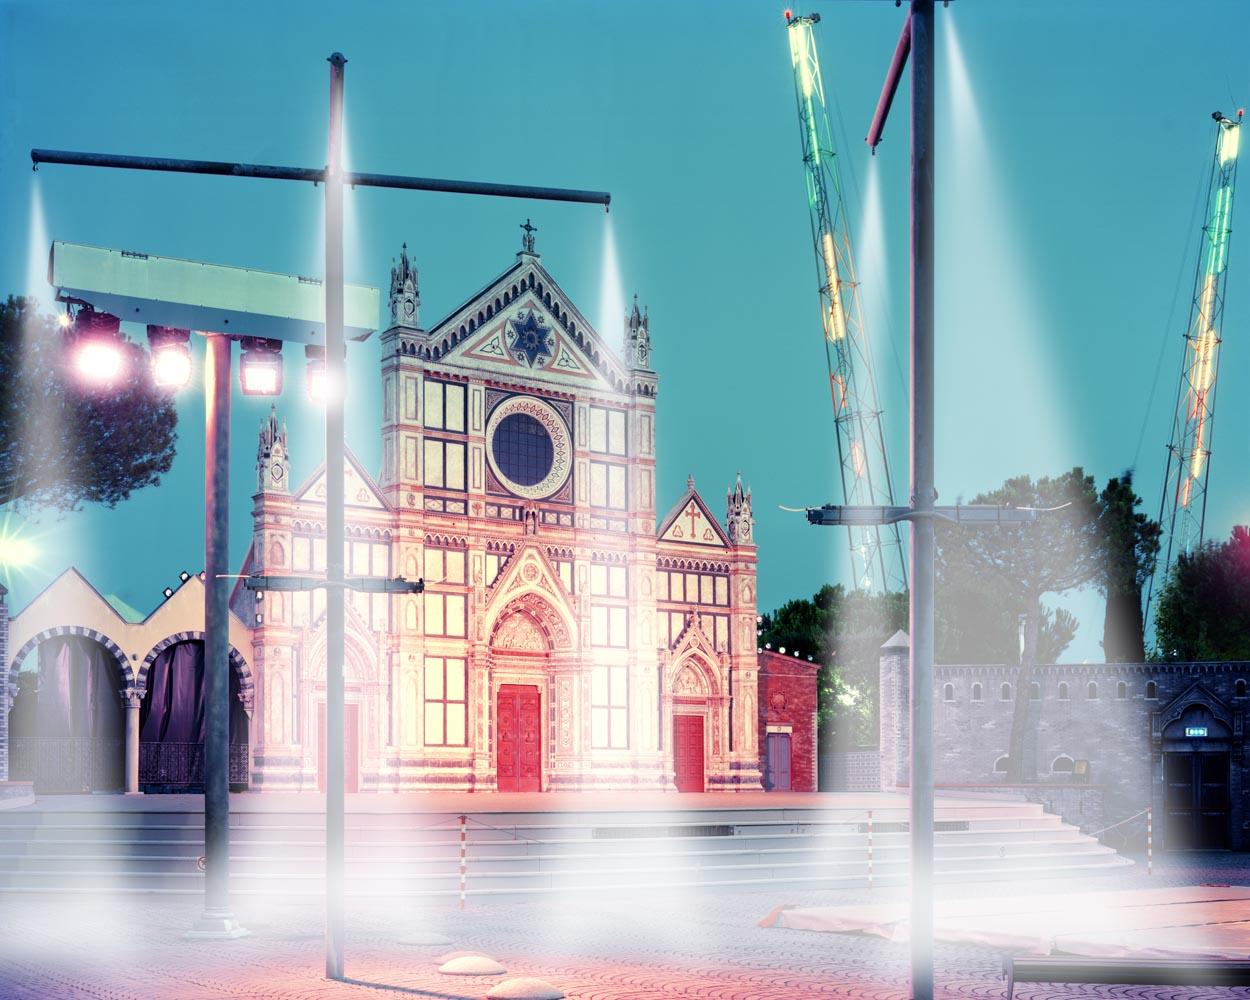 Little Italy #10, 2010 C-print on Diasec o stampa digitale su carta Hahnemuhle, cm 170x200 - 80x100 - 39x47,5 - 42x60 (ed. 3 - ed. 5 - ed. 20 - ed. 20)